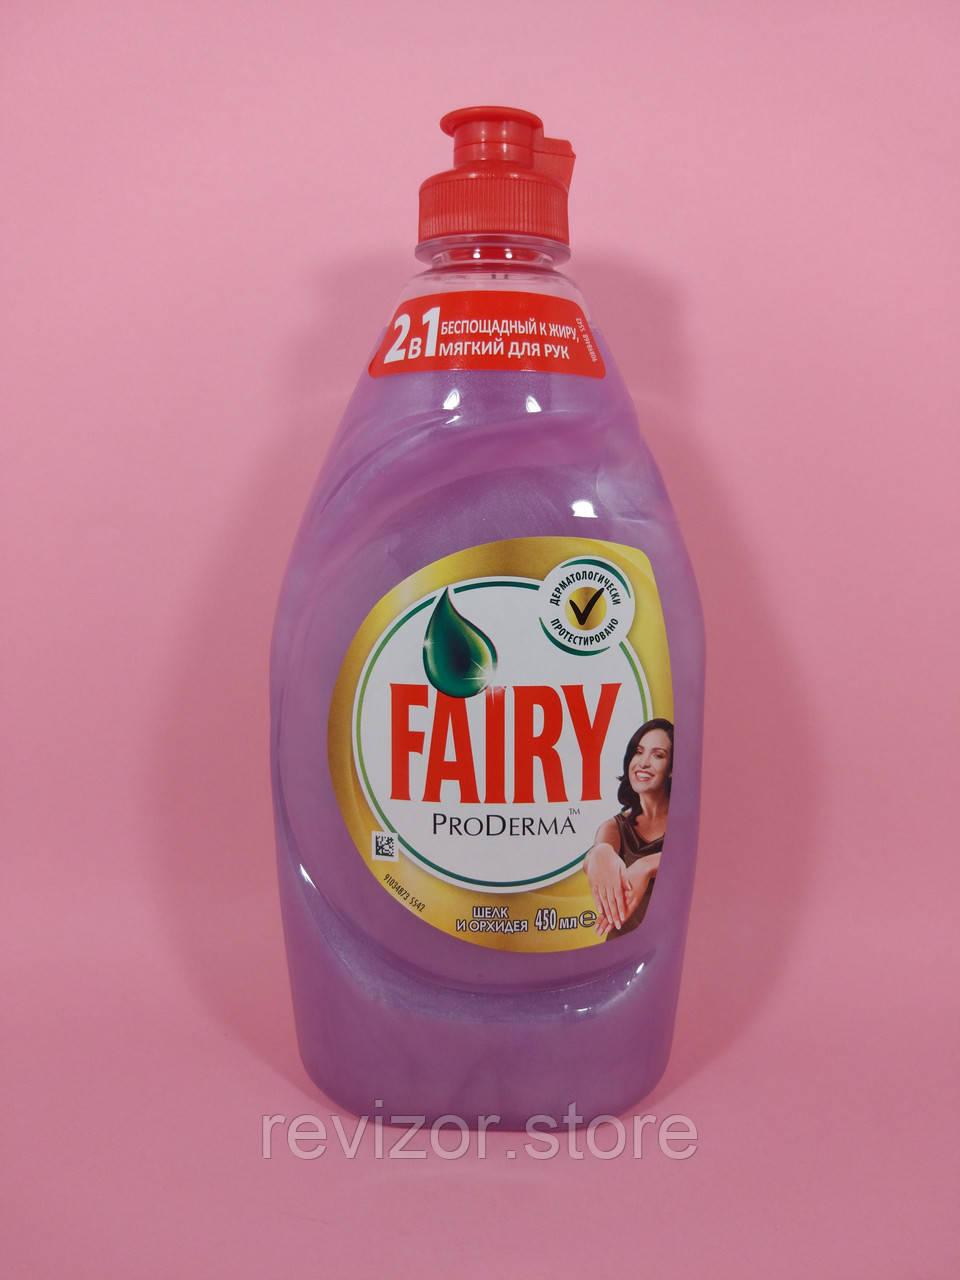 Fairy ProDerma - Средство для мытья посуды Шёлк и Орхидея 450мл